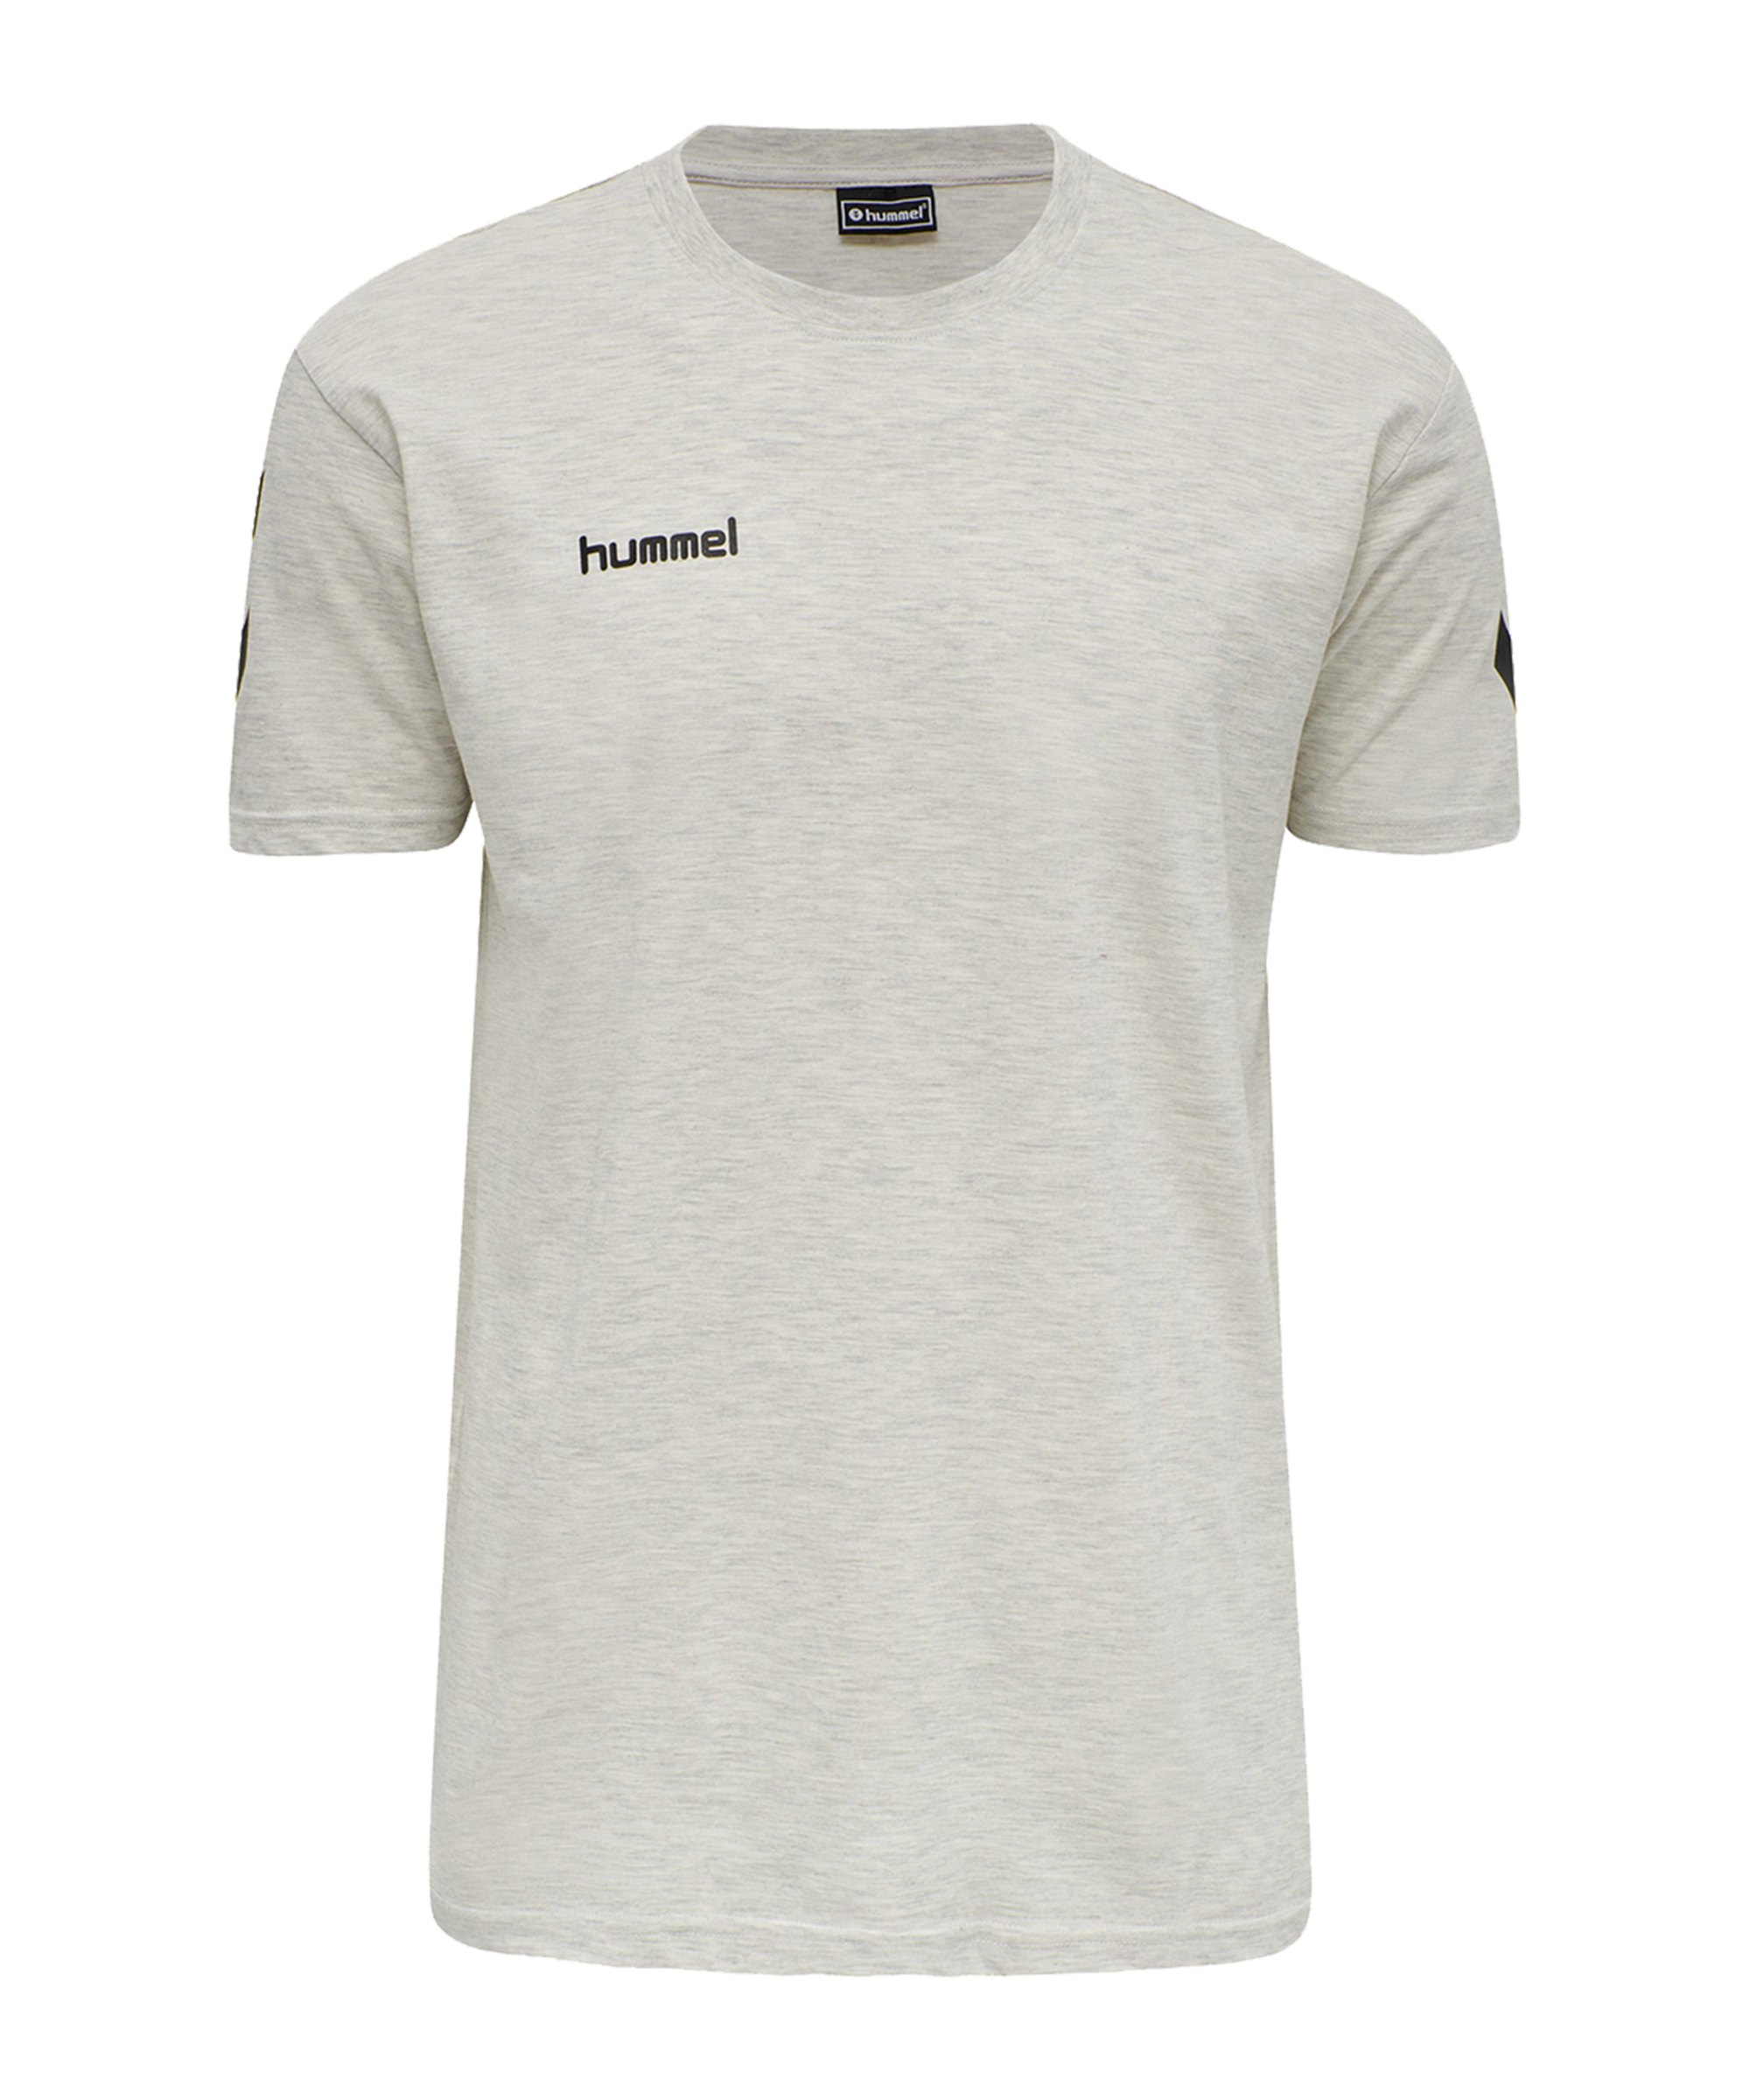 Hummel Cotton T-Shirt Beige F9158 - beige